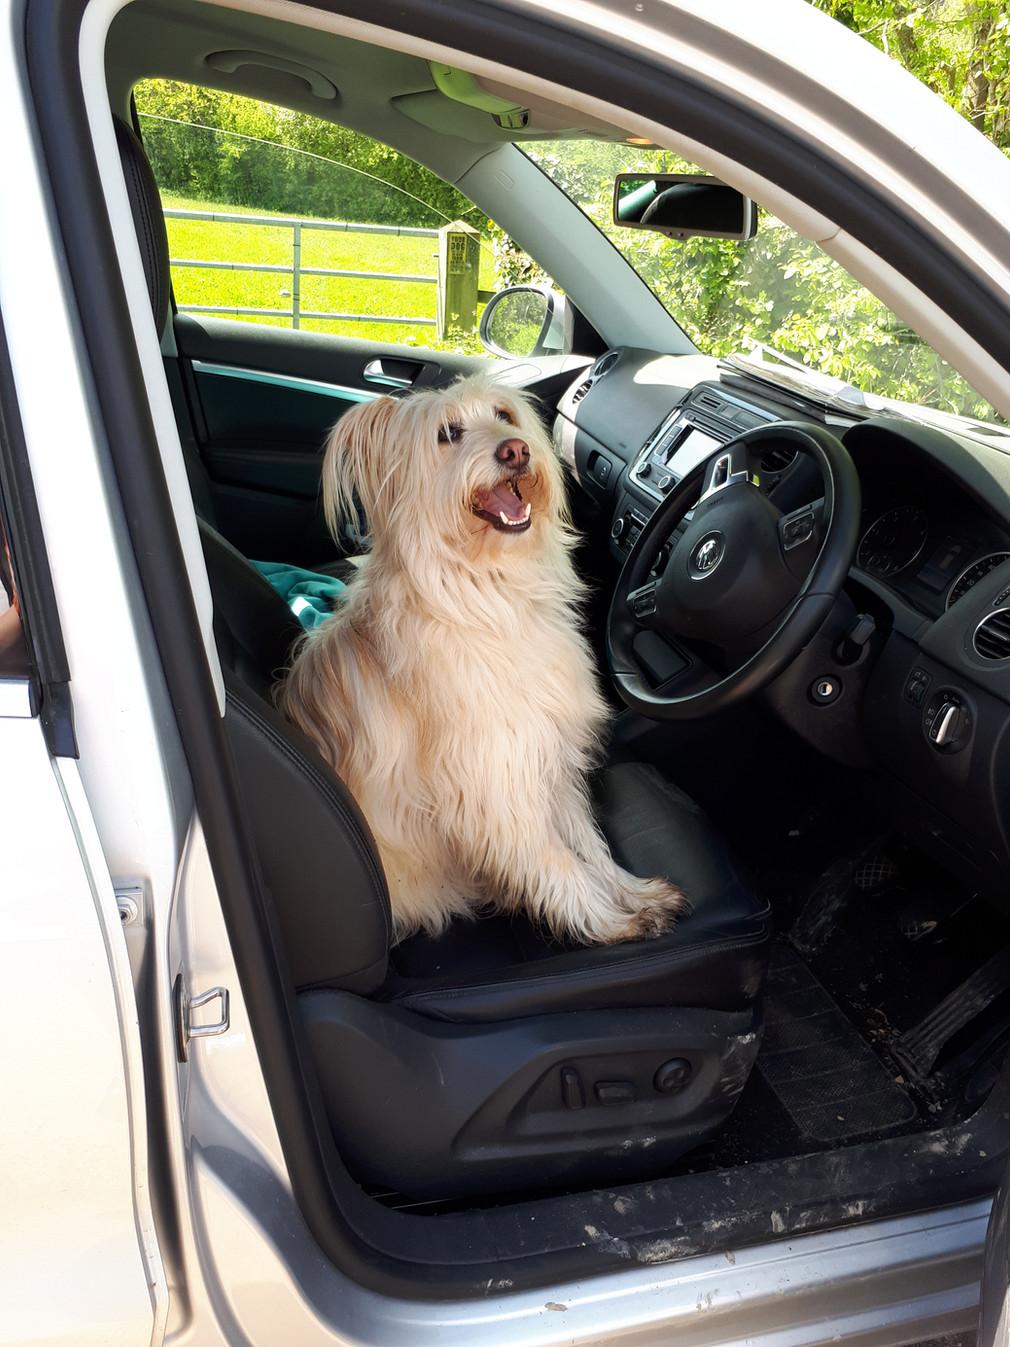 New driver